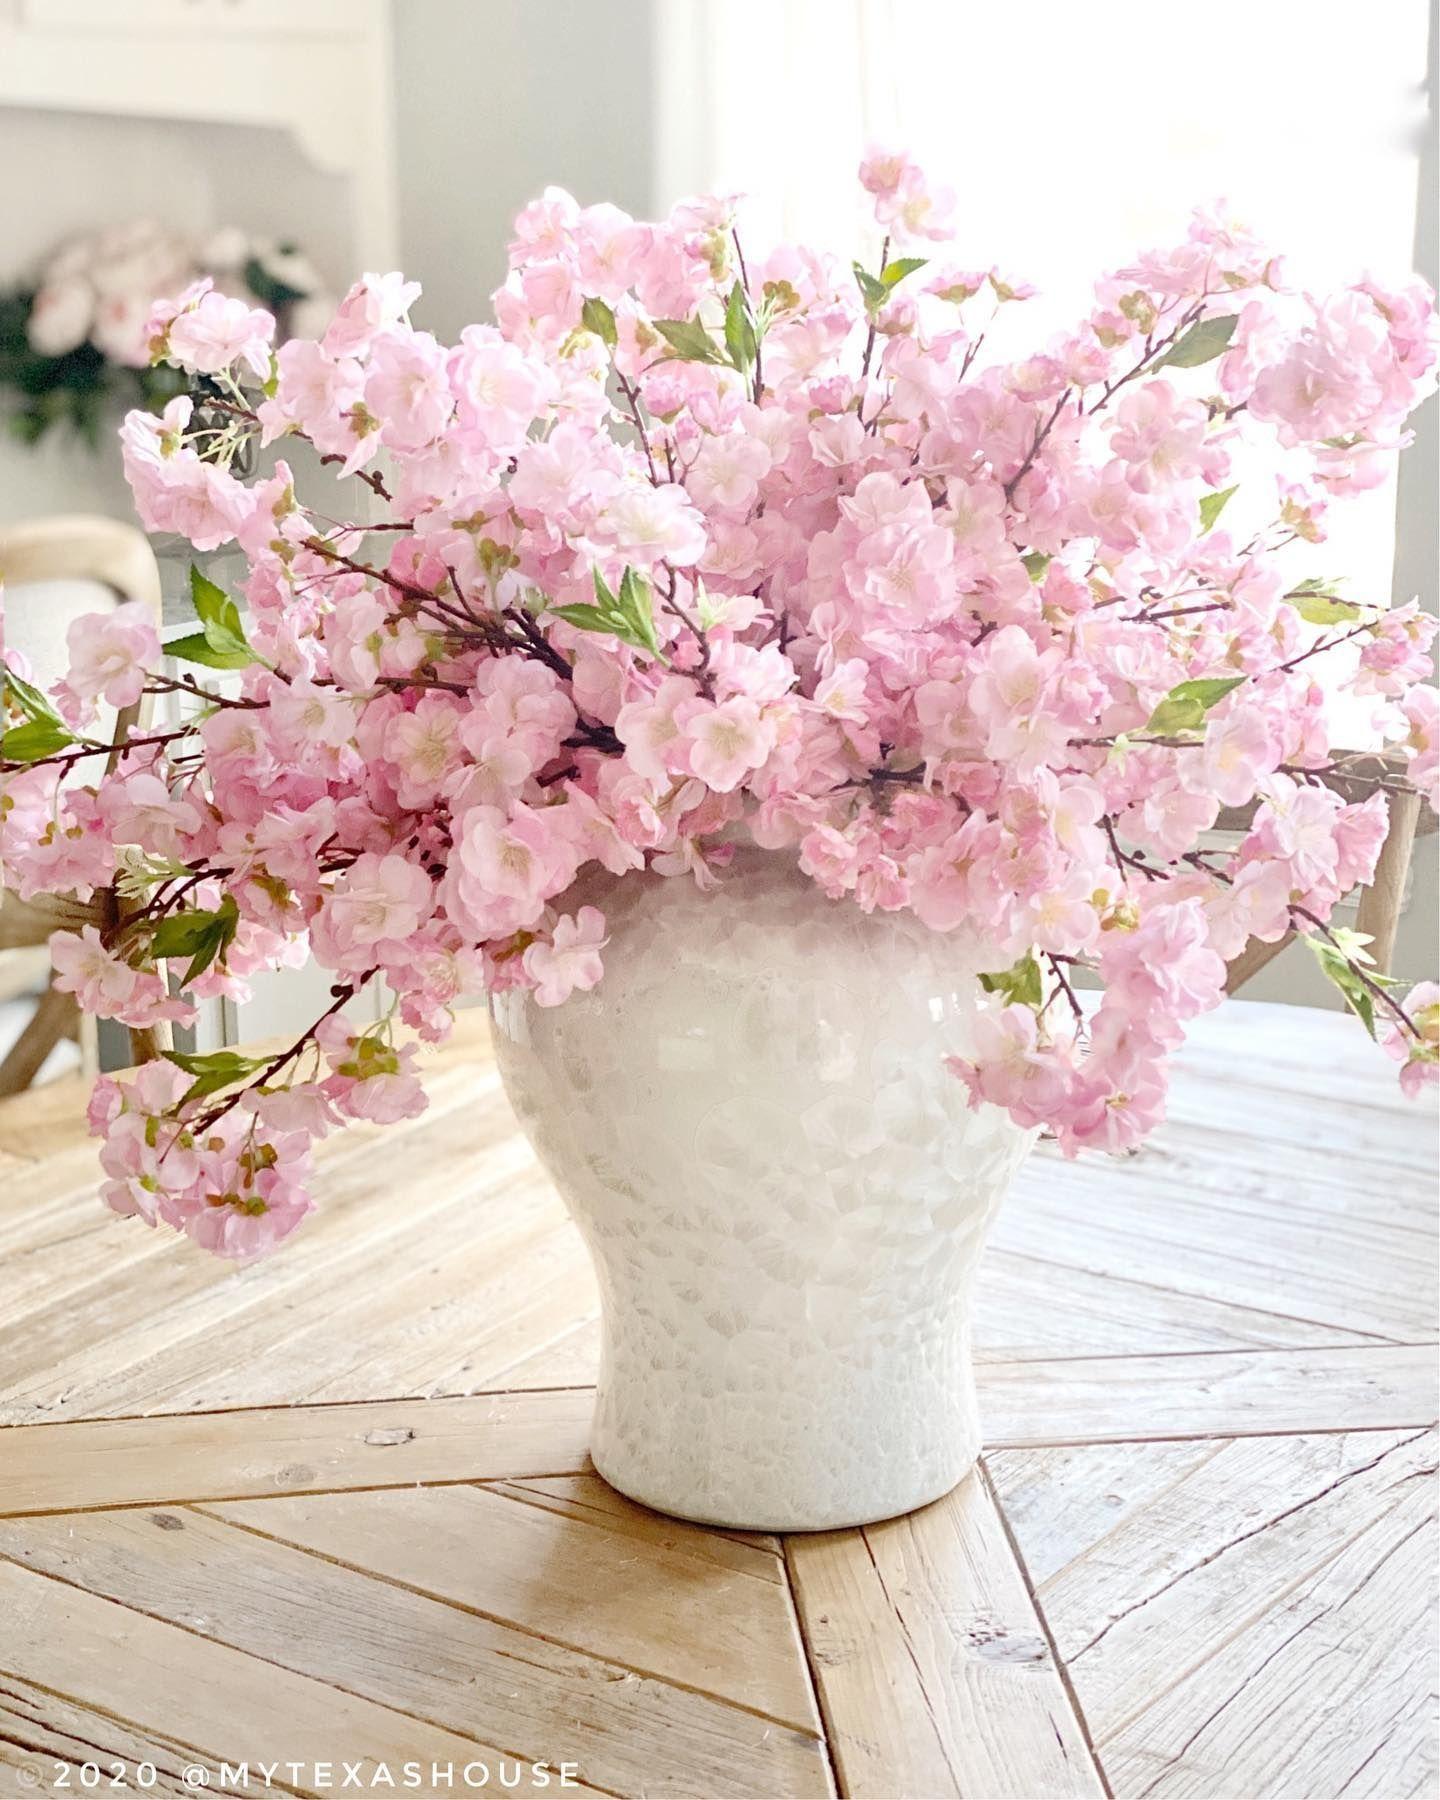 Pink Cherry Blossom Arrangement Fake Flowers Decor Pink Flower Arrangements Beautiful Flower Arrangements